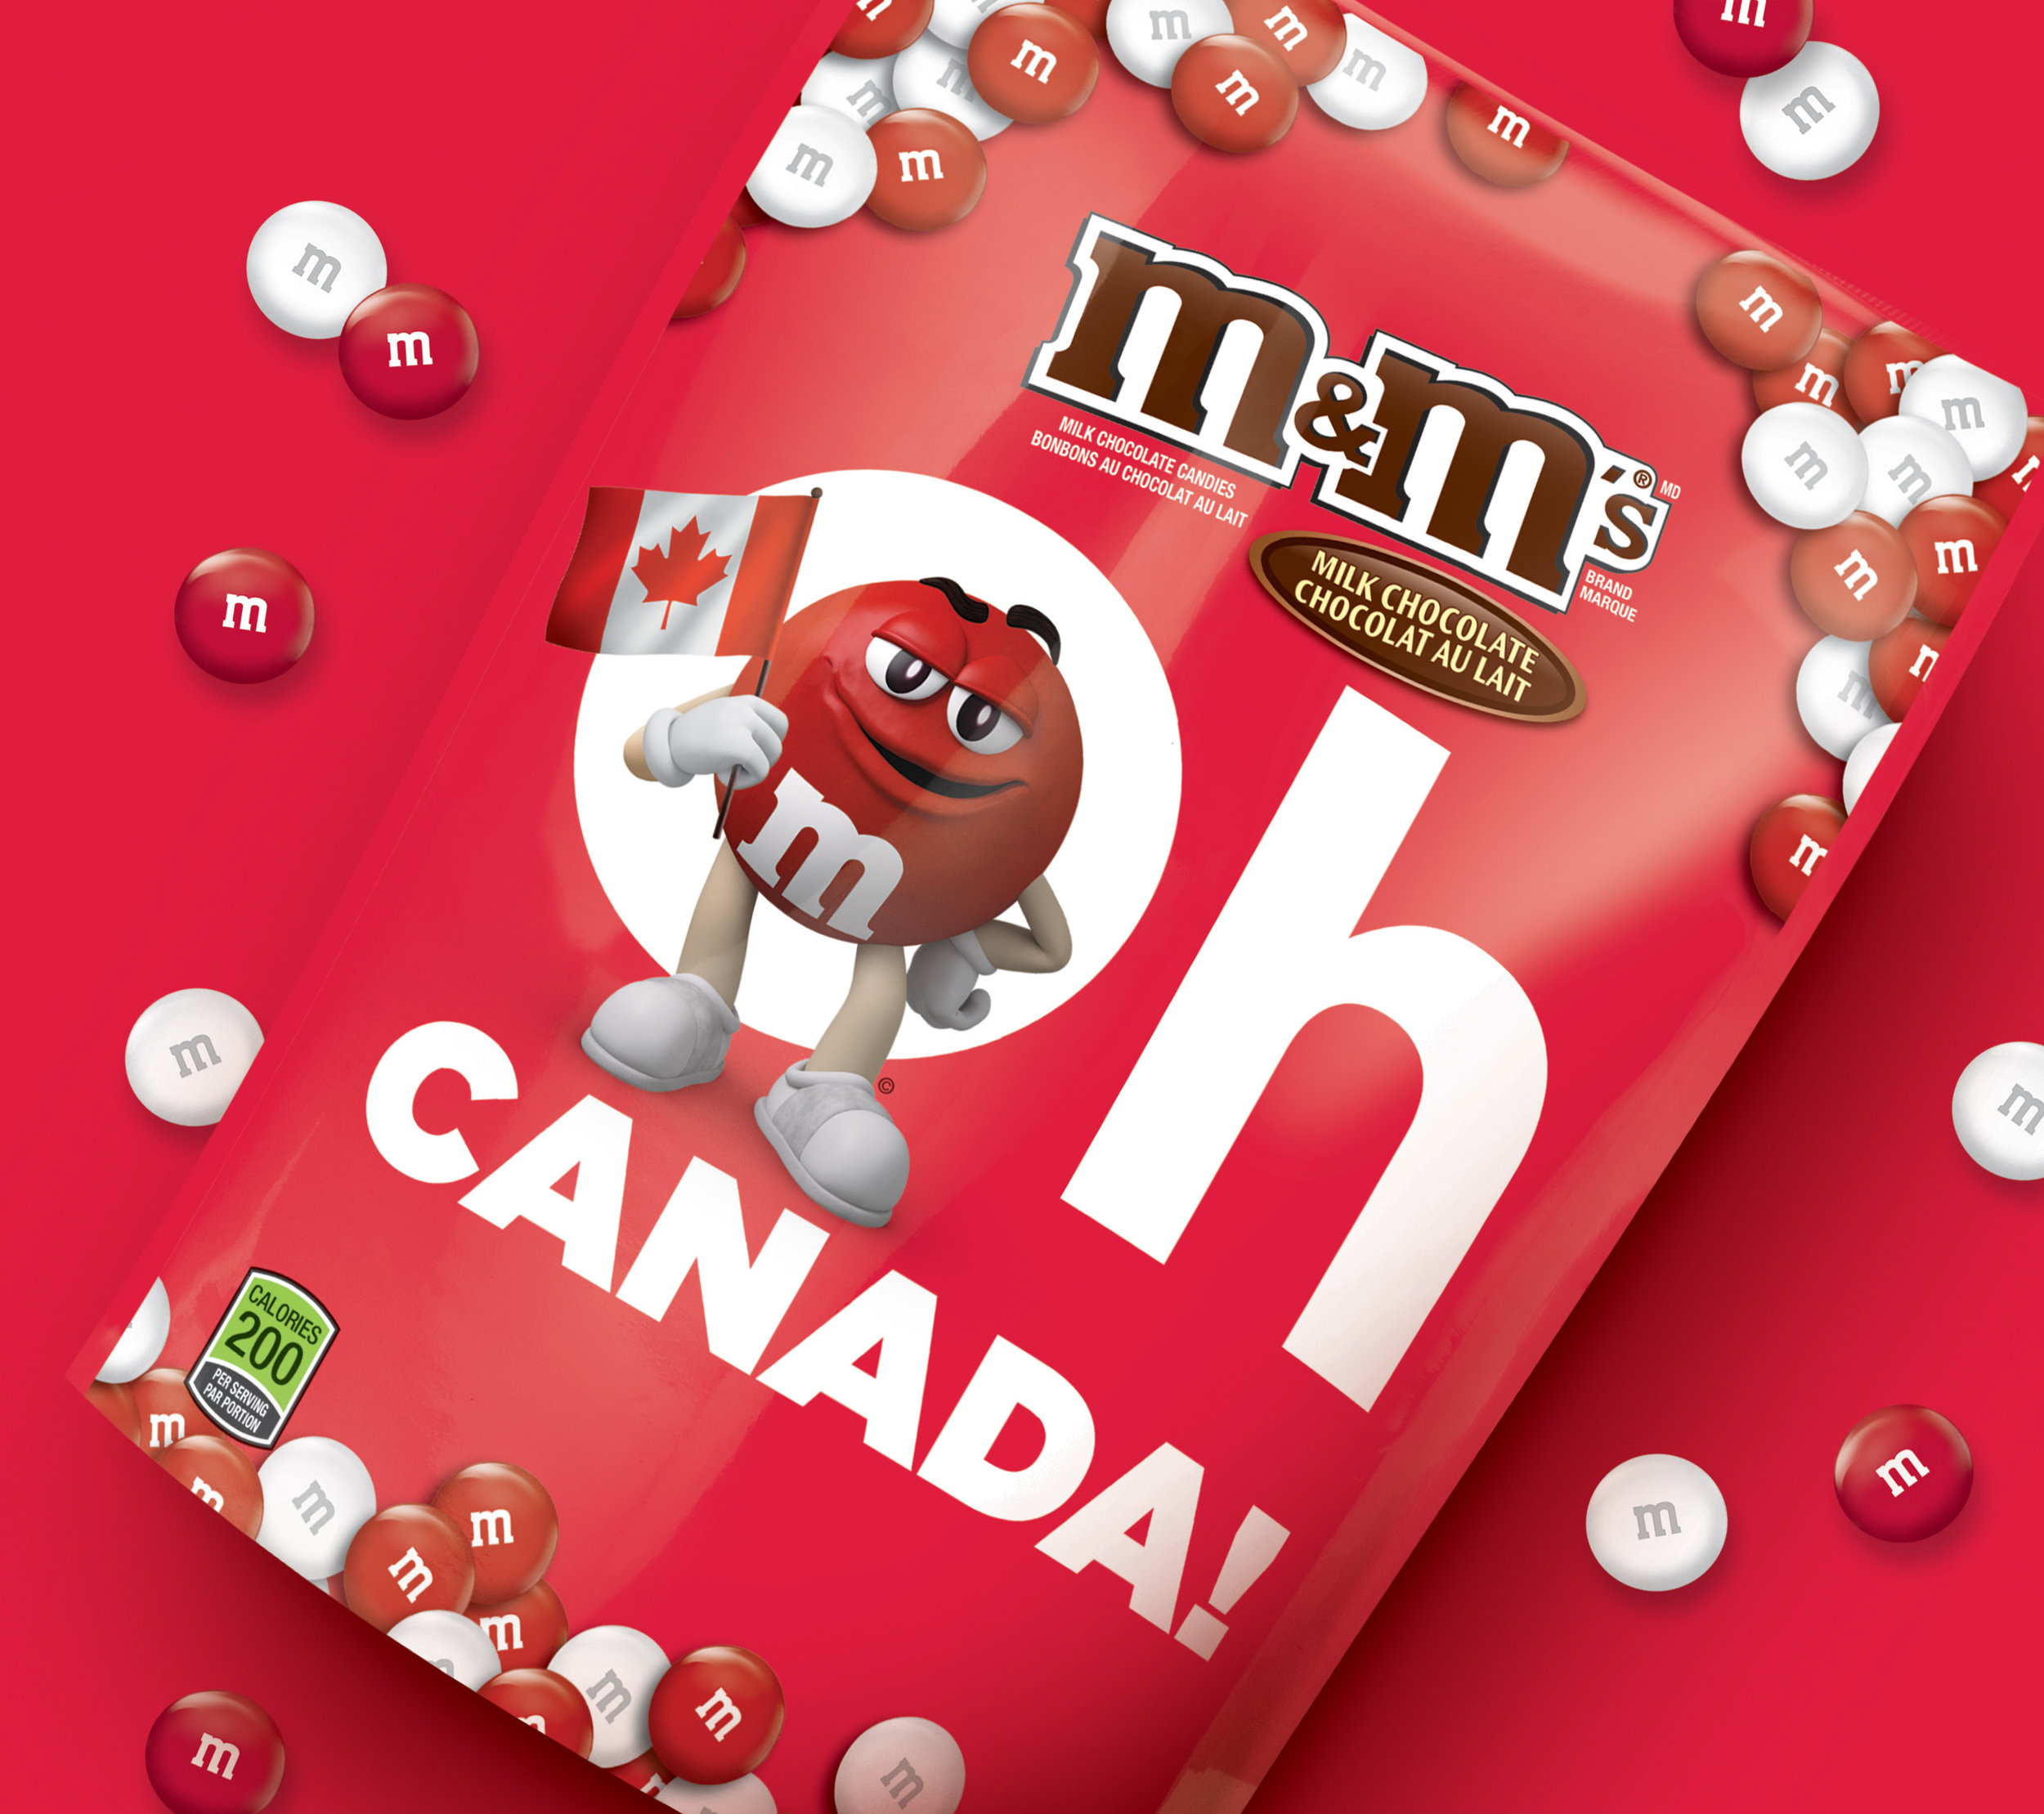 Mars-Canada-MMs-American-Package-Design-Awards-GDUSA.jpg